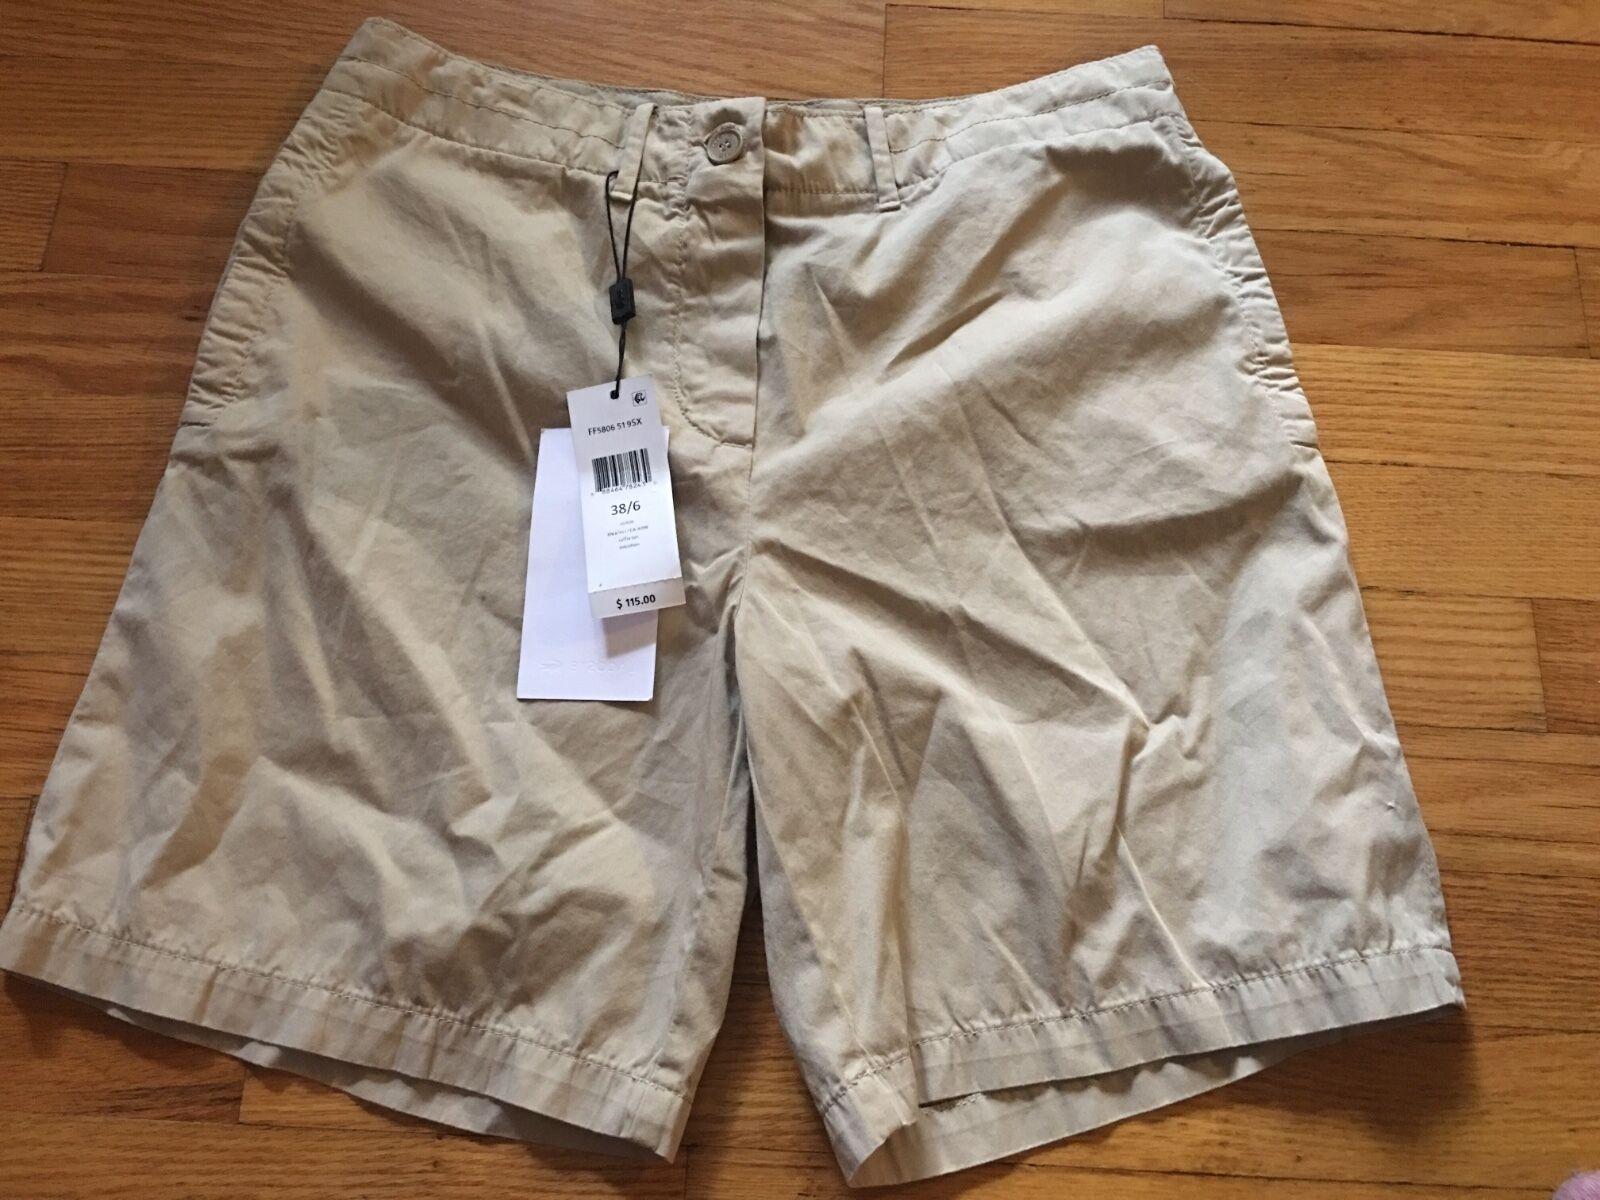 115 Lacoste Women's Khaki 100% Cotton Bermuda Walking Shorts 38 (6)